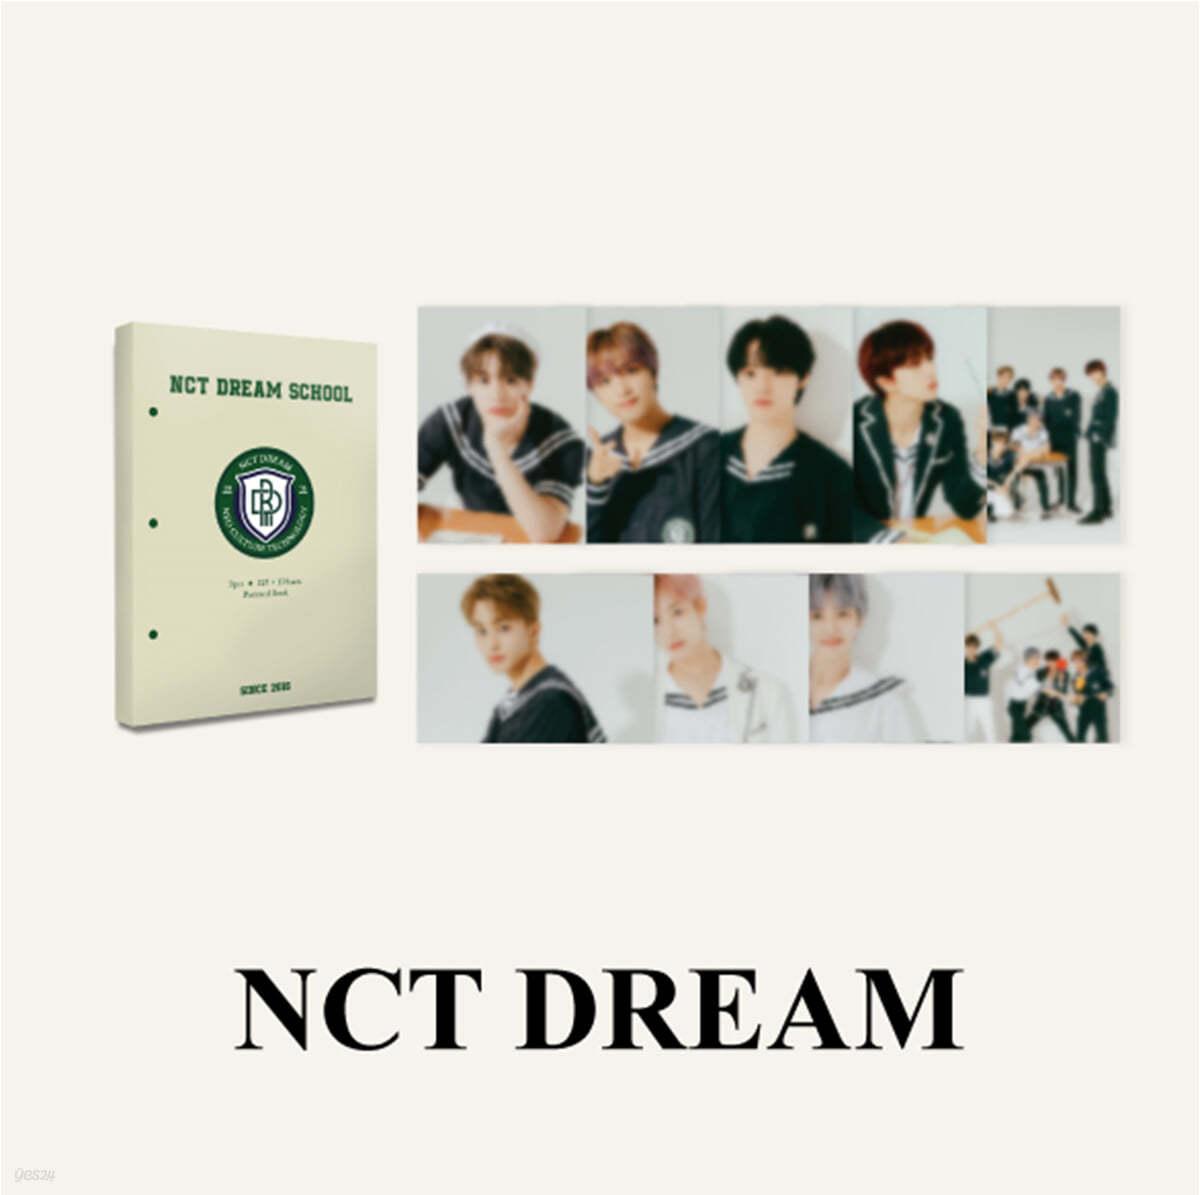 [NCT DREAM] 2021 BSK HARD COVER POSTCARD BOOK